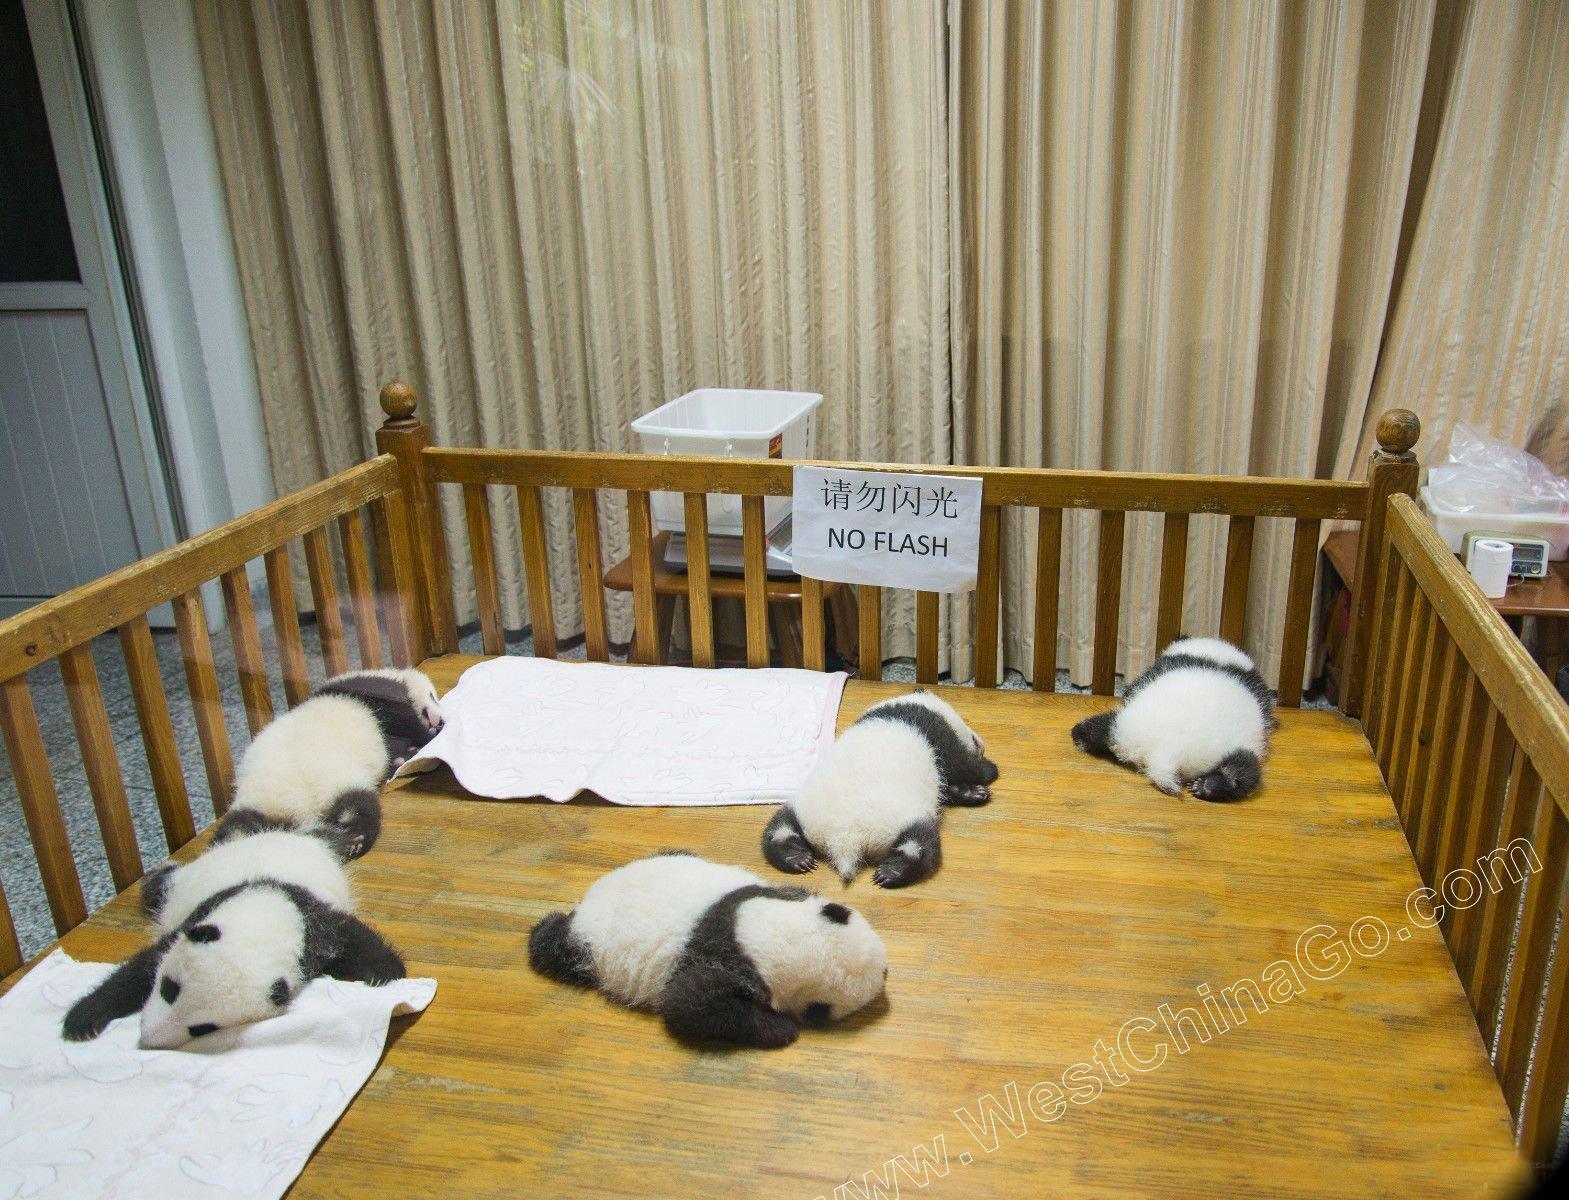 Chengdu Panda Breeding Center Tour